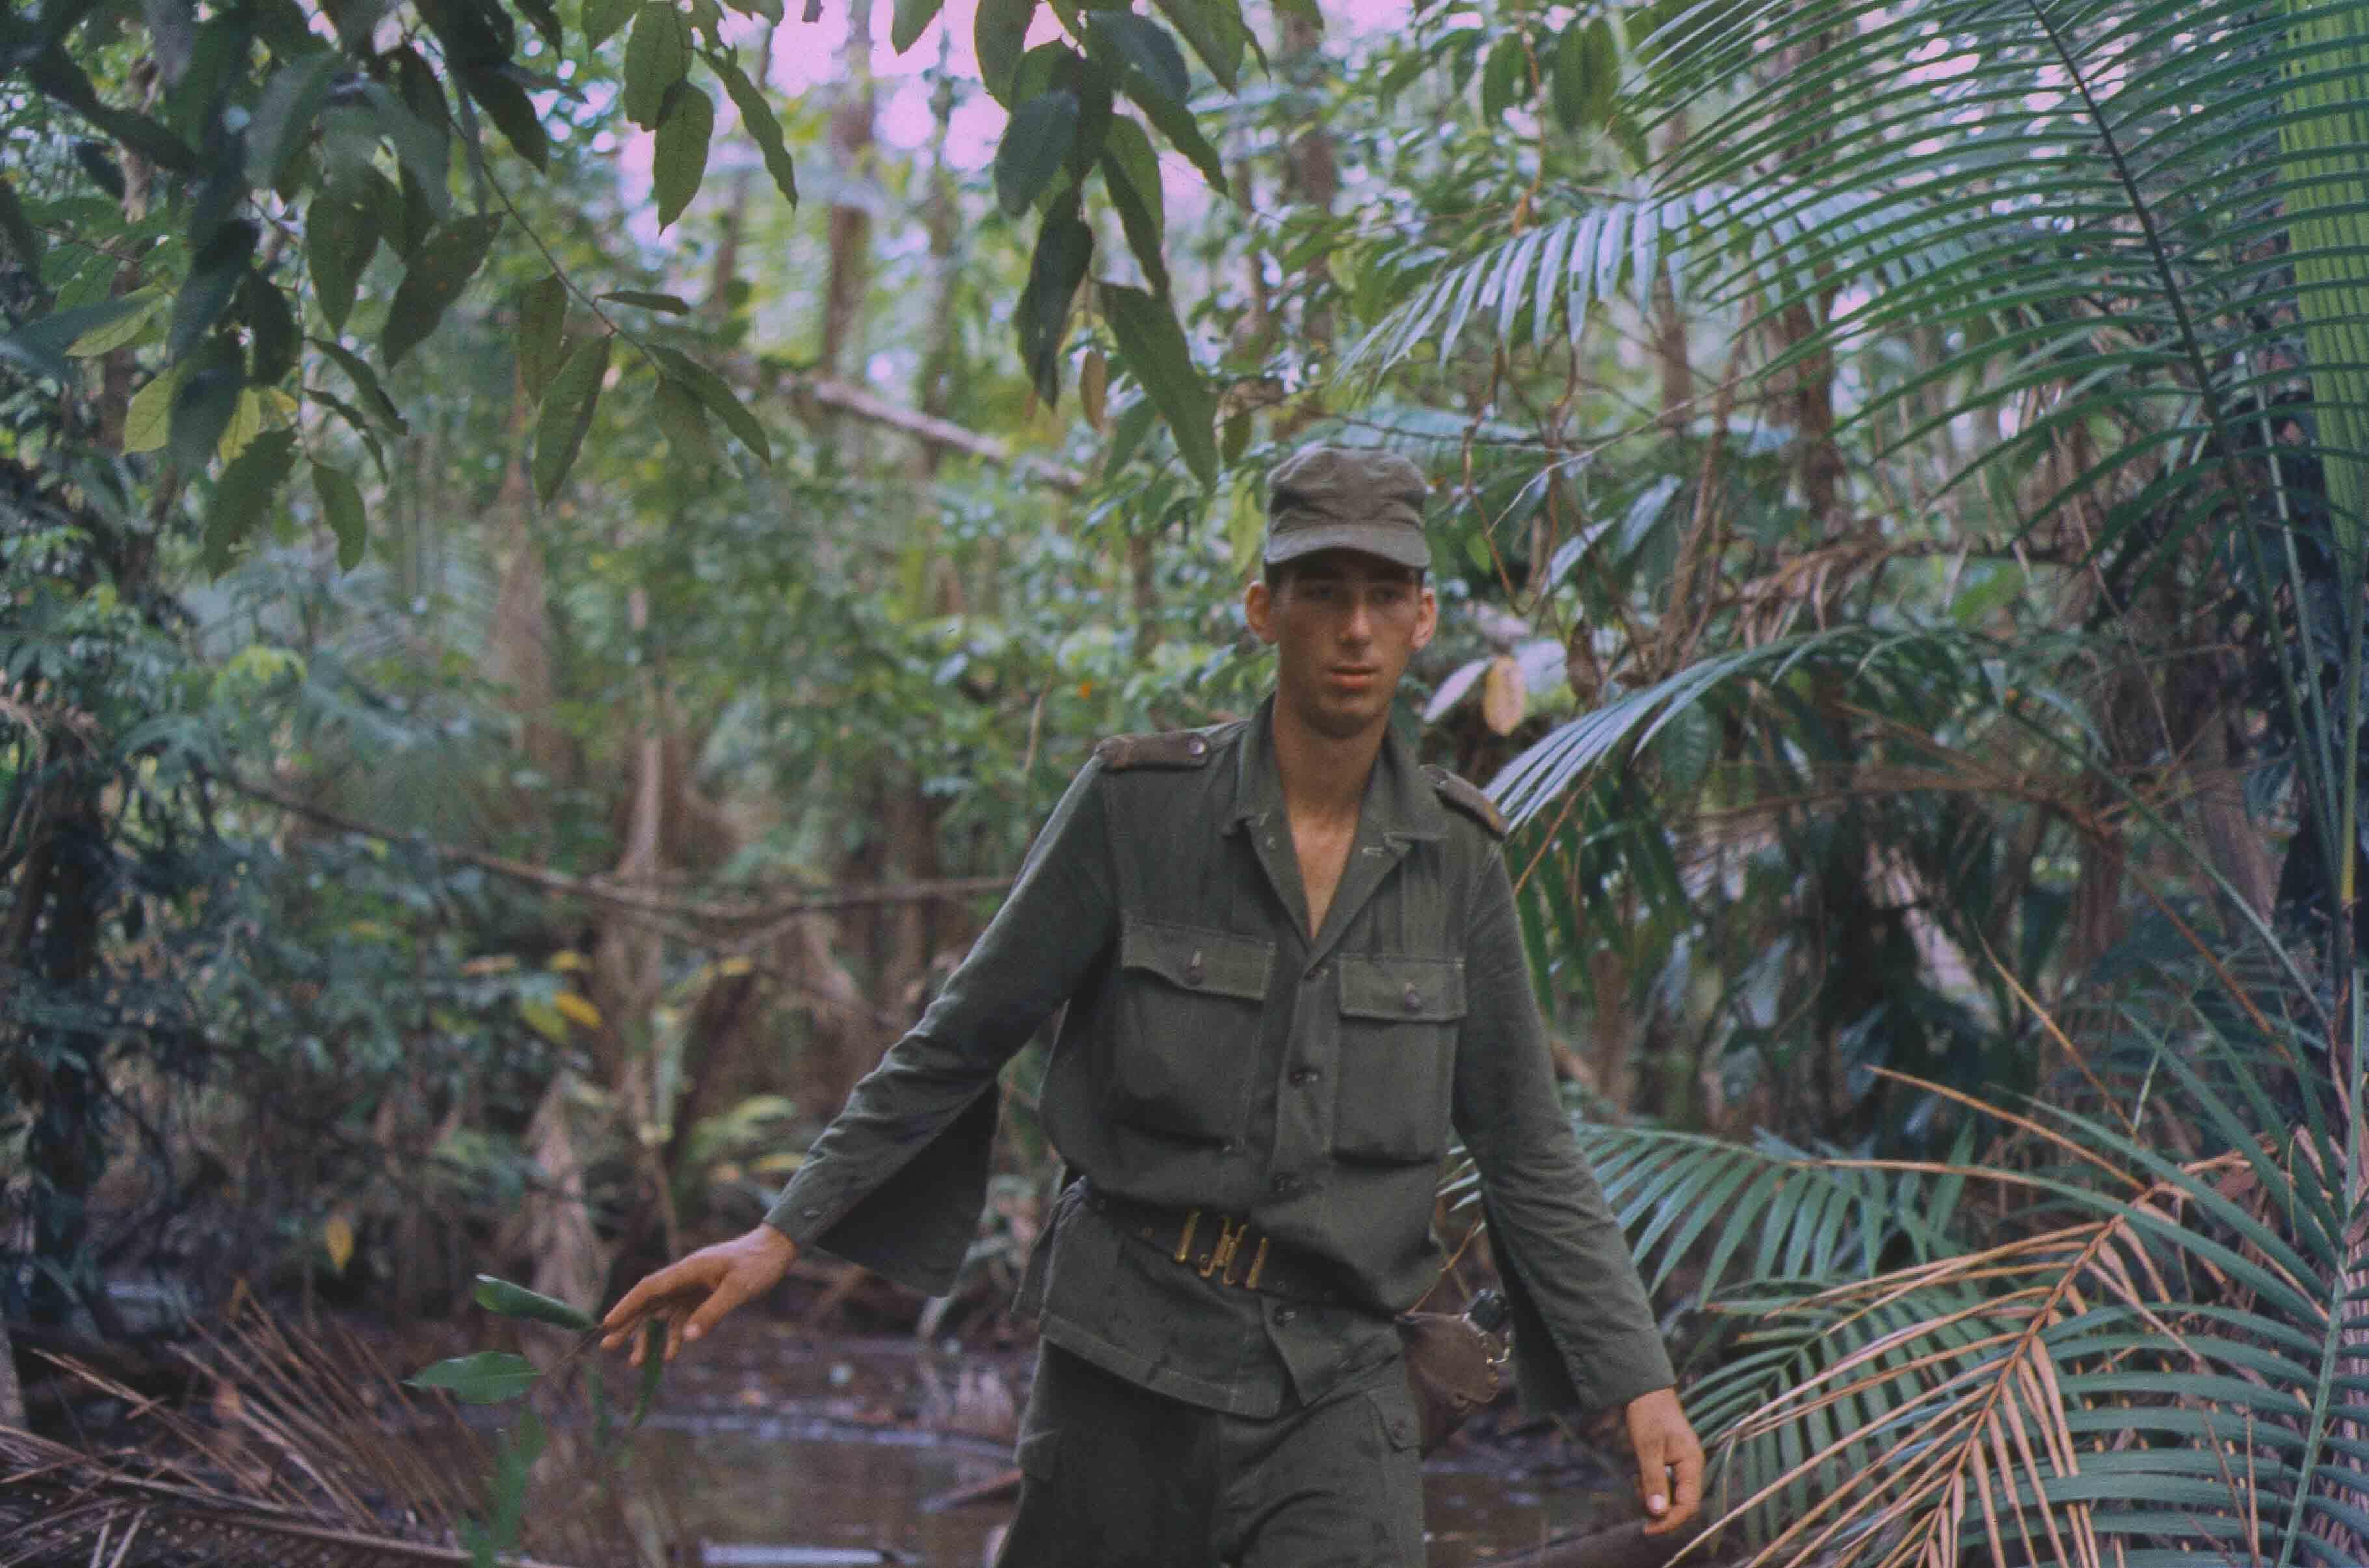 378. Suriname